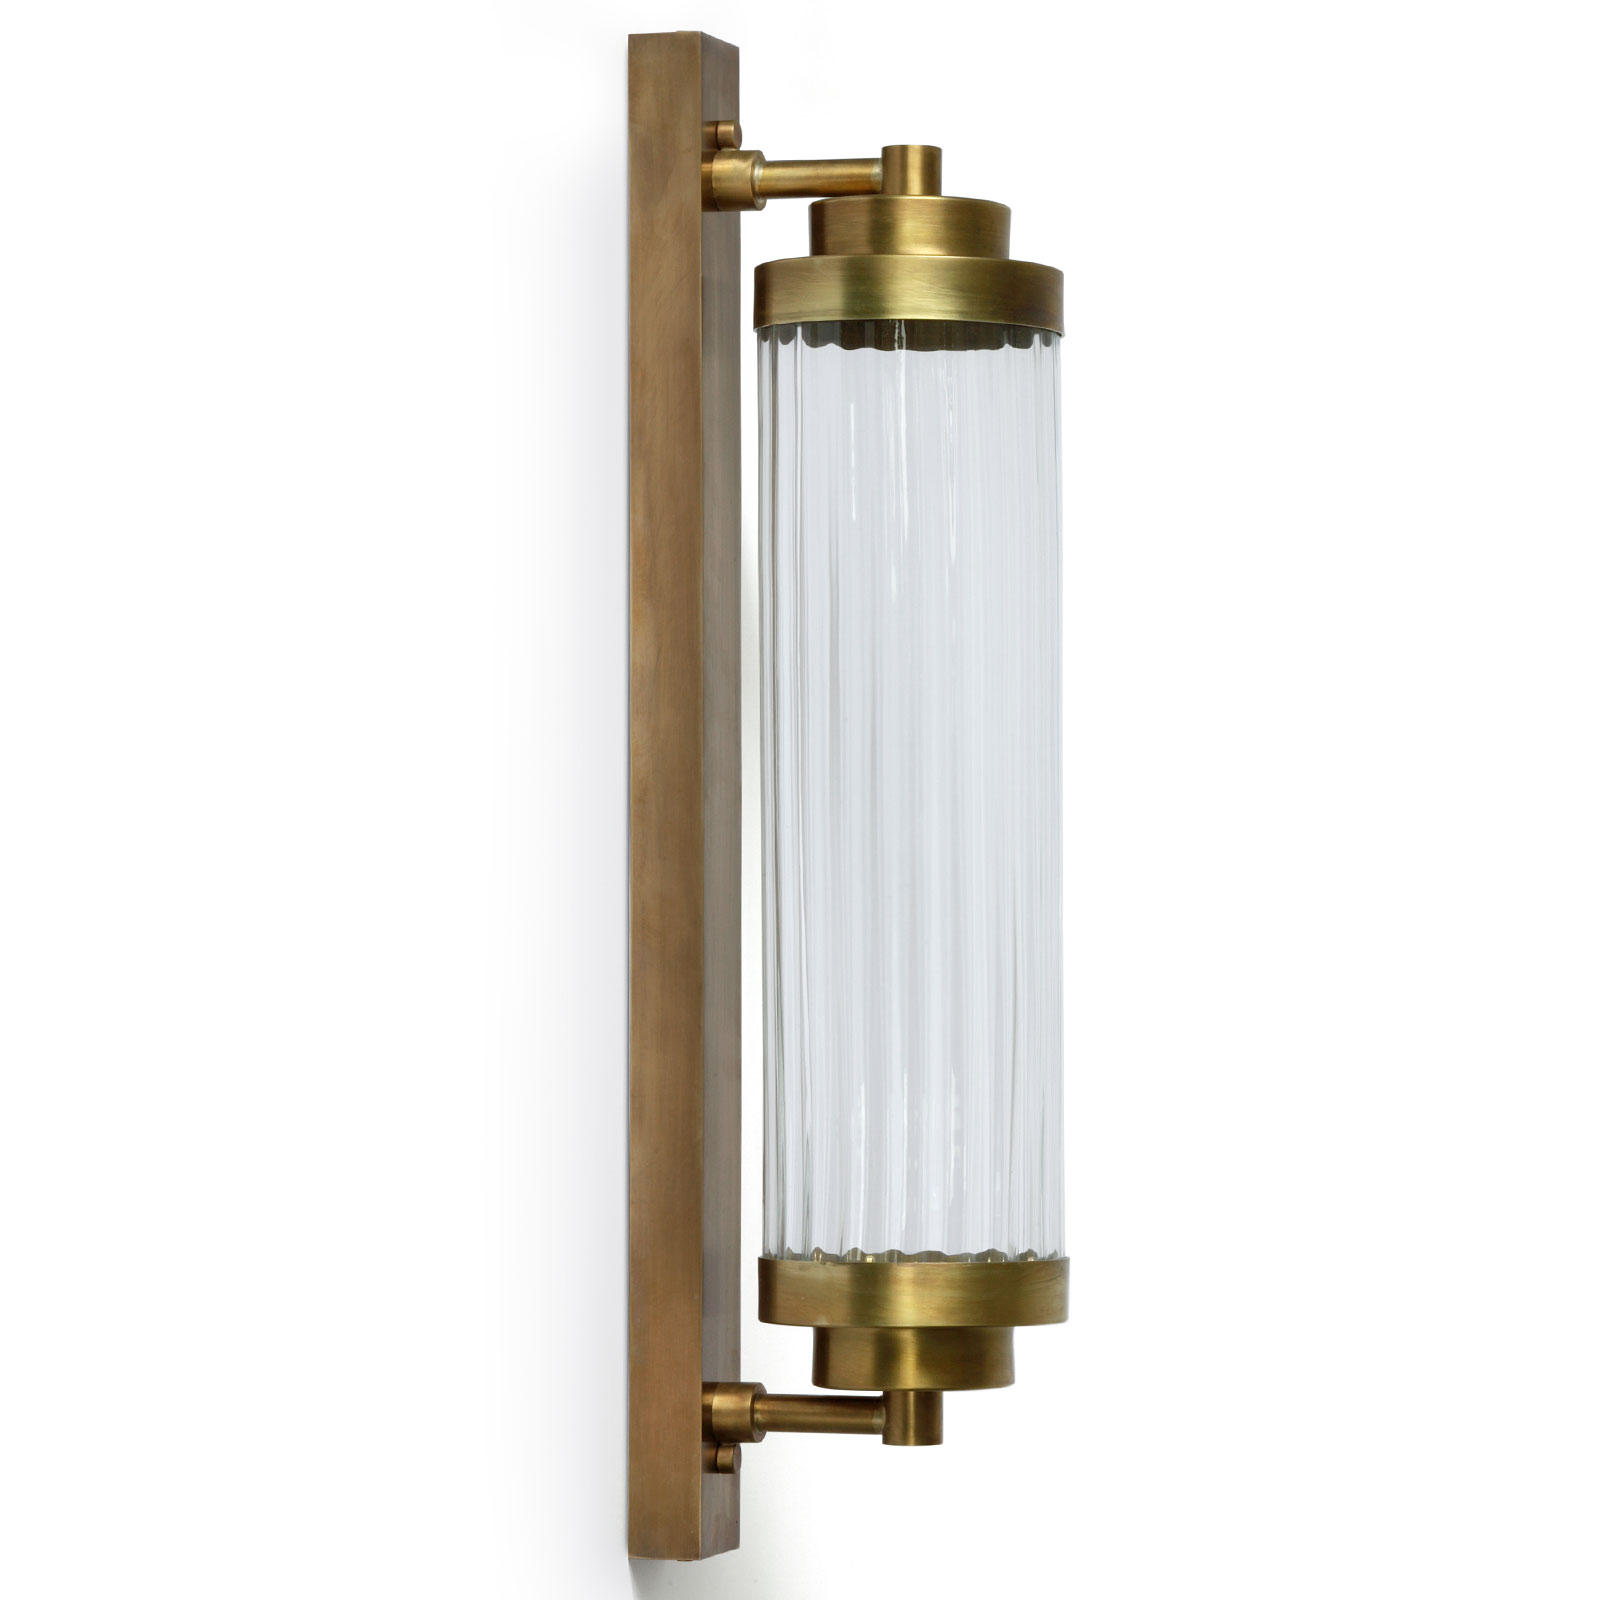 Art Deco Pillar Wall Light Brass Crafted With Led Source A202 Casa Lumi